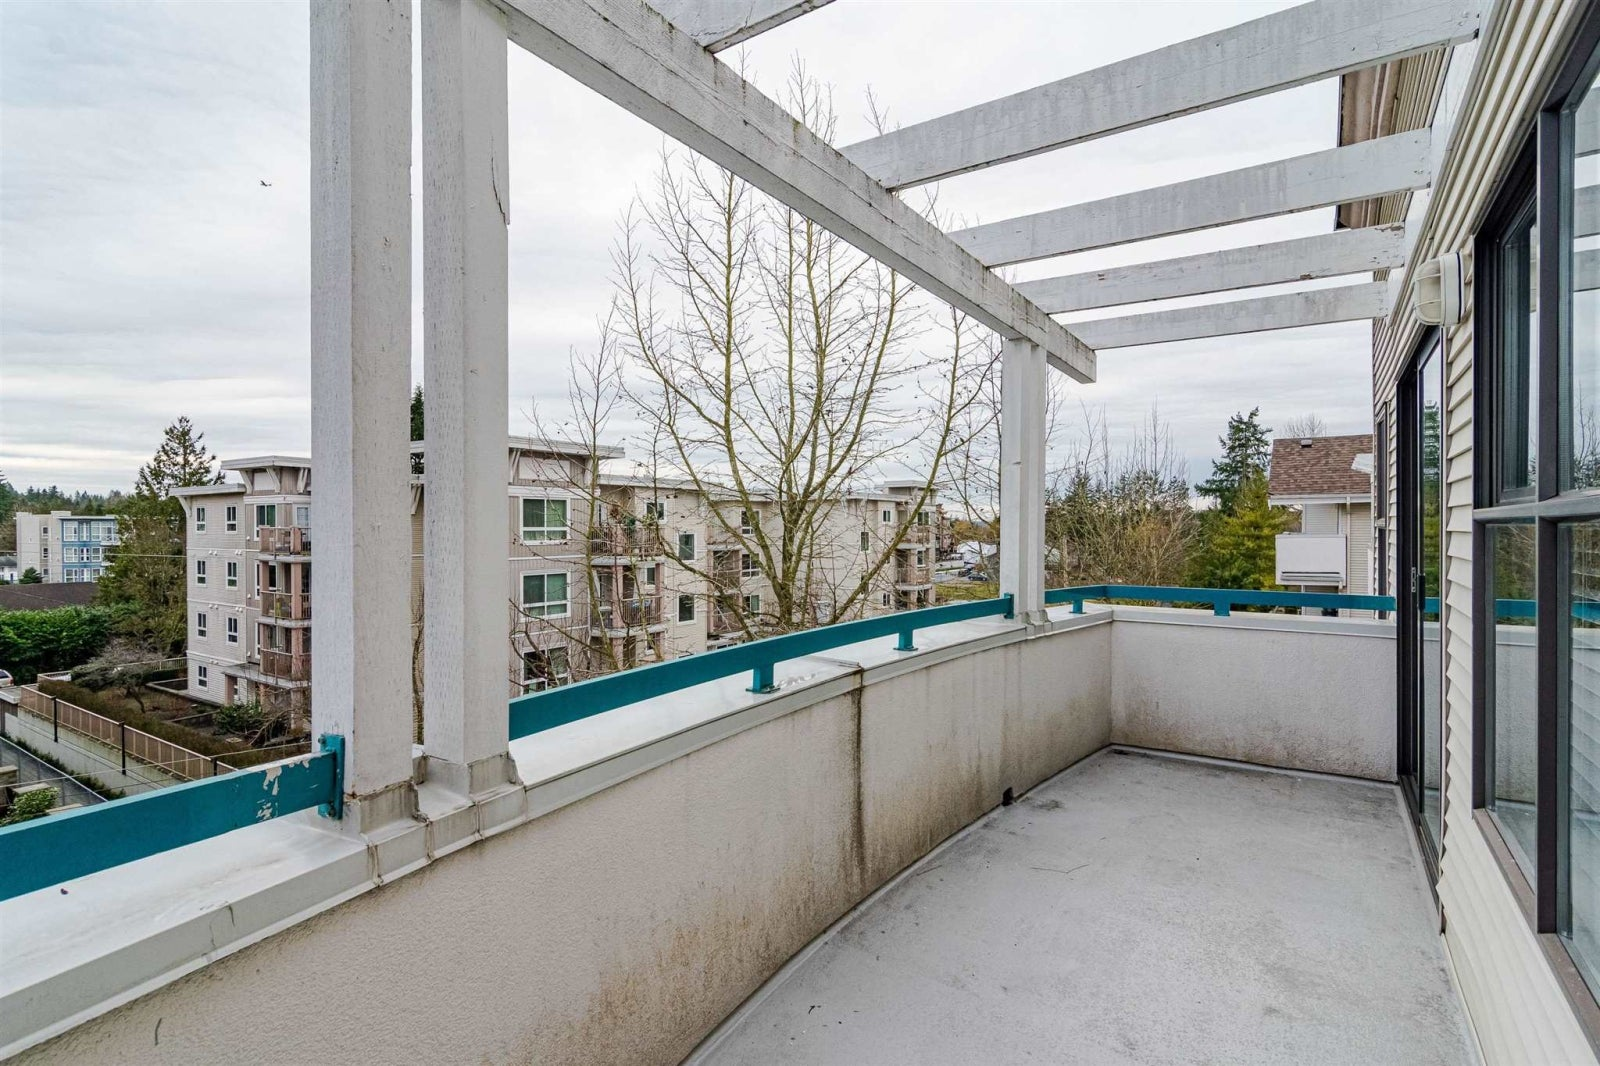 405 20268 54 AVENUE - Langley City Apartment/Condo for sale, 2 Bedrooms (R2604183) #19